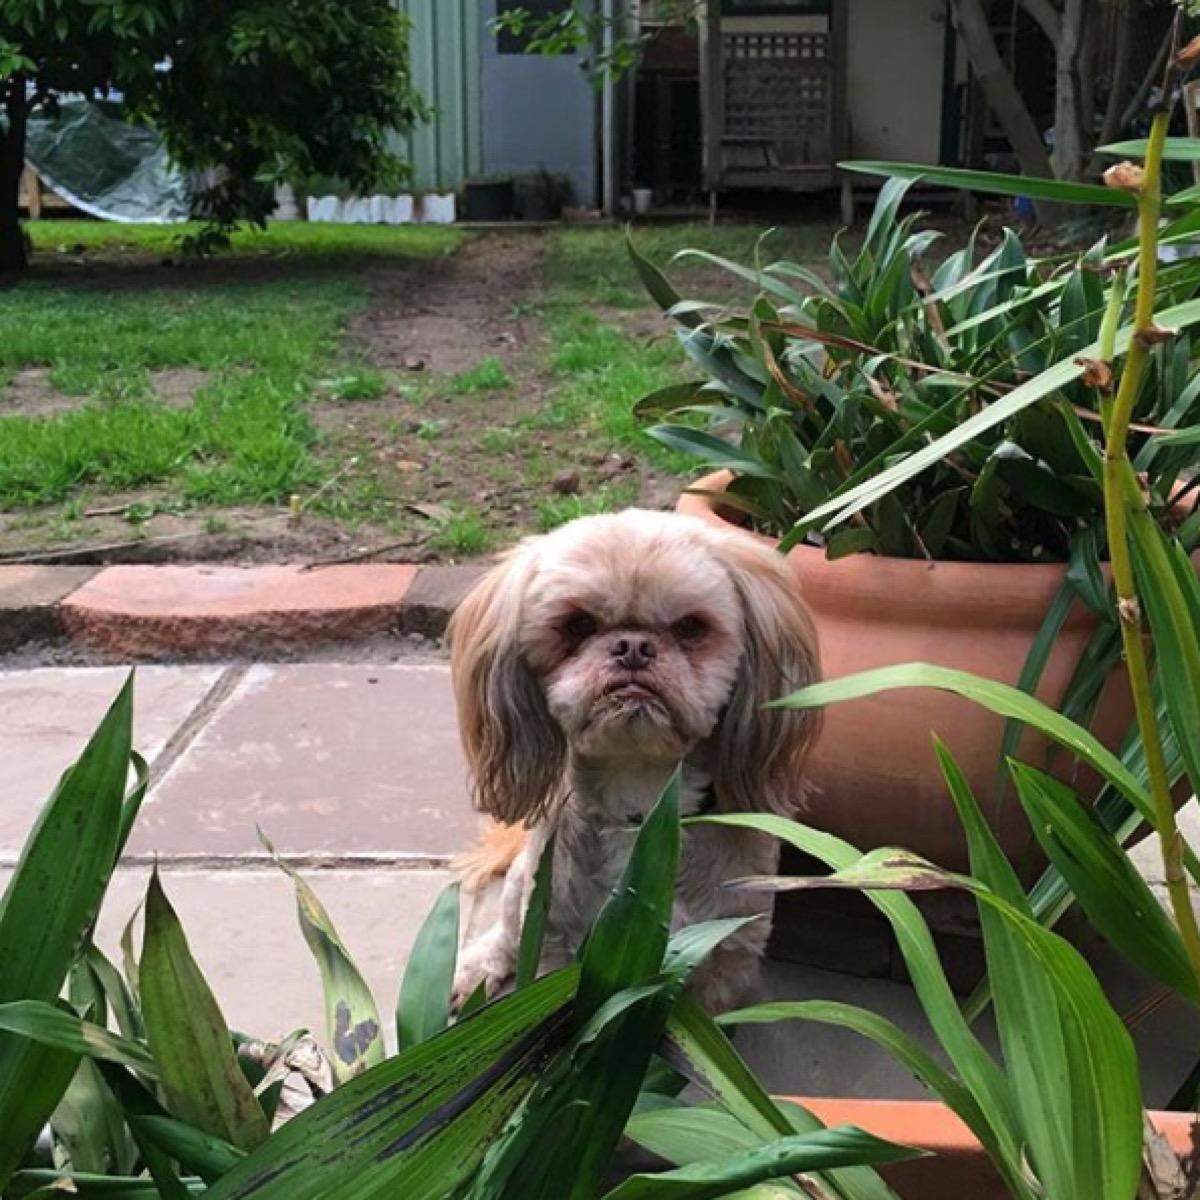 grumpy dog in the yard